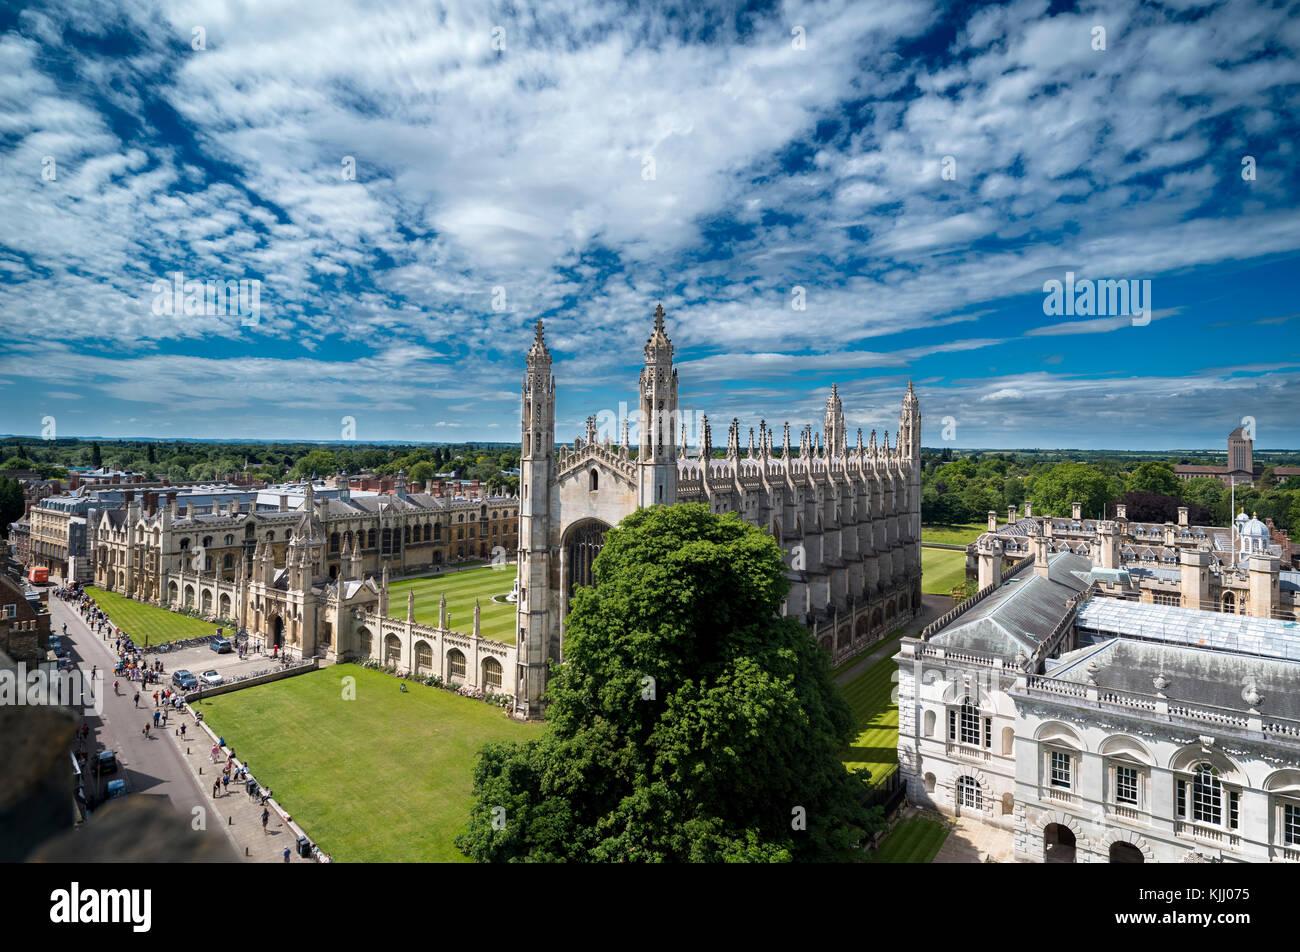 KING'S COLLEGE (1441) CAMBRIDGE CAMBRIDGESHIRE ROYAUME UNI Photo Stock